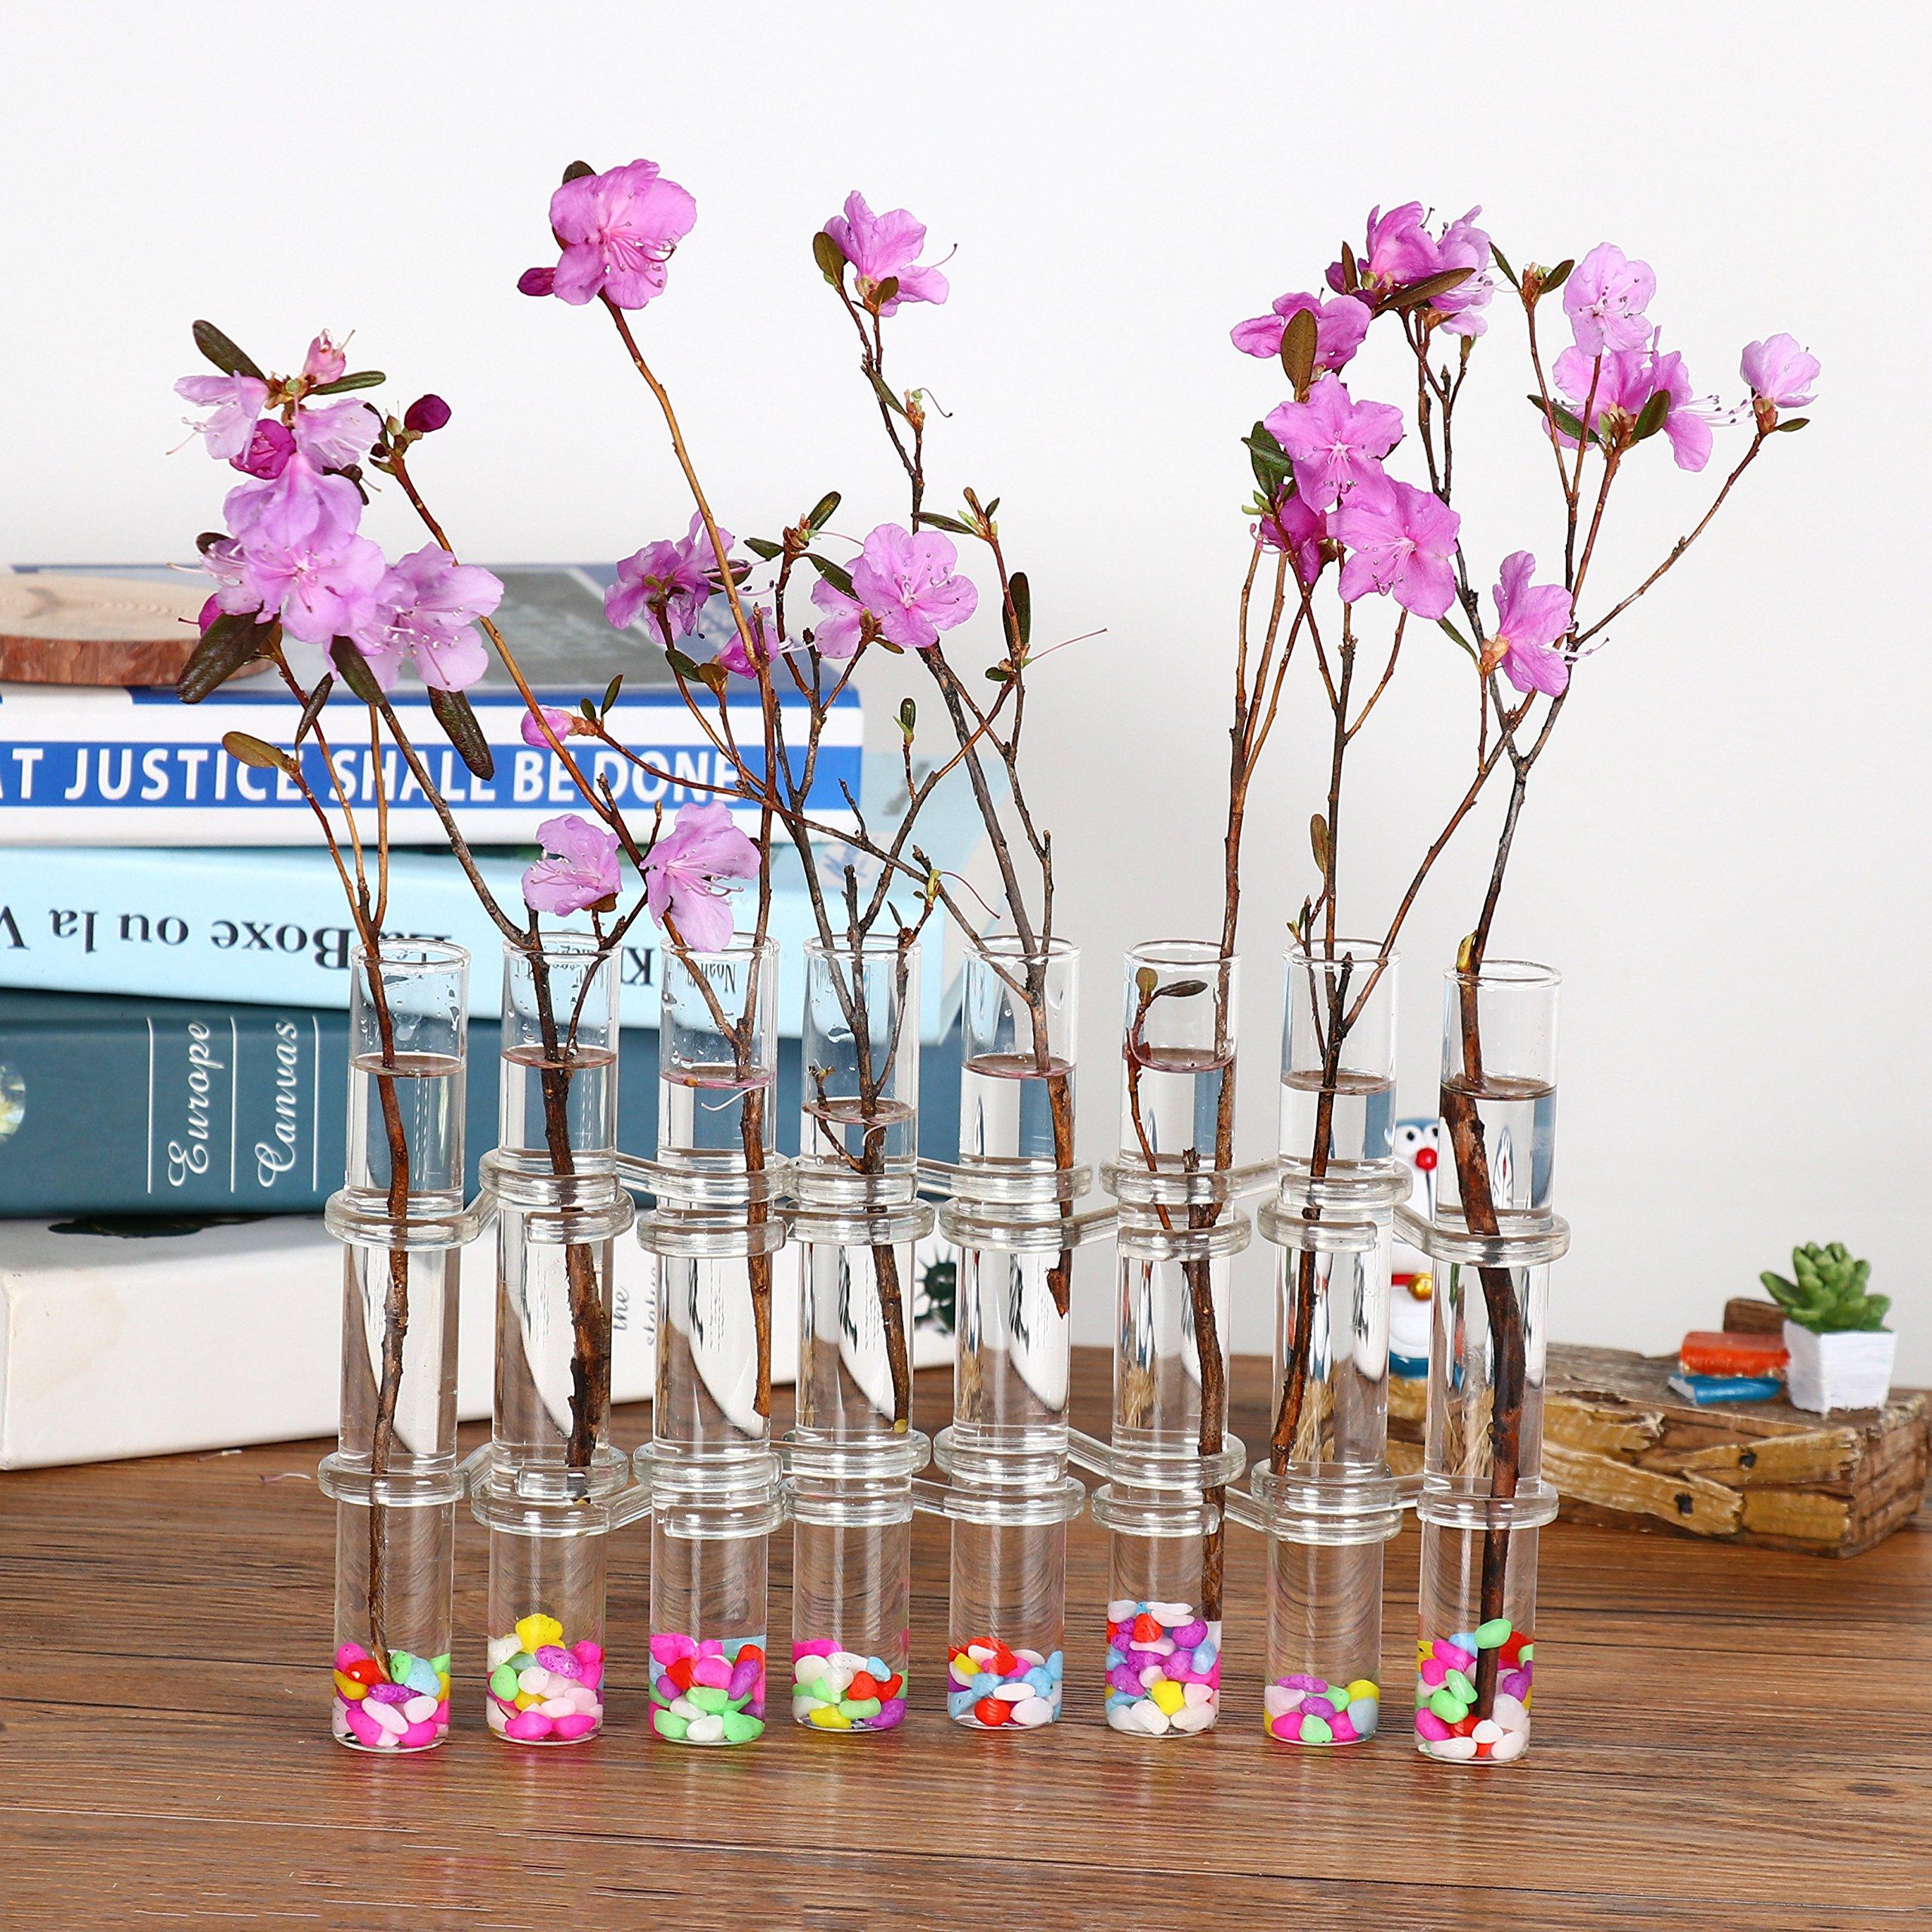 Ivolador 8 Crystal Glass Test Tube Vase Flower Pots for Hydroponic Plants Home Garden Decoration